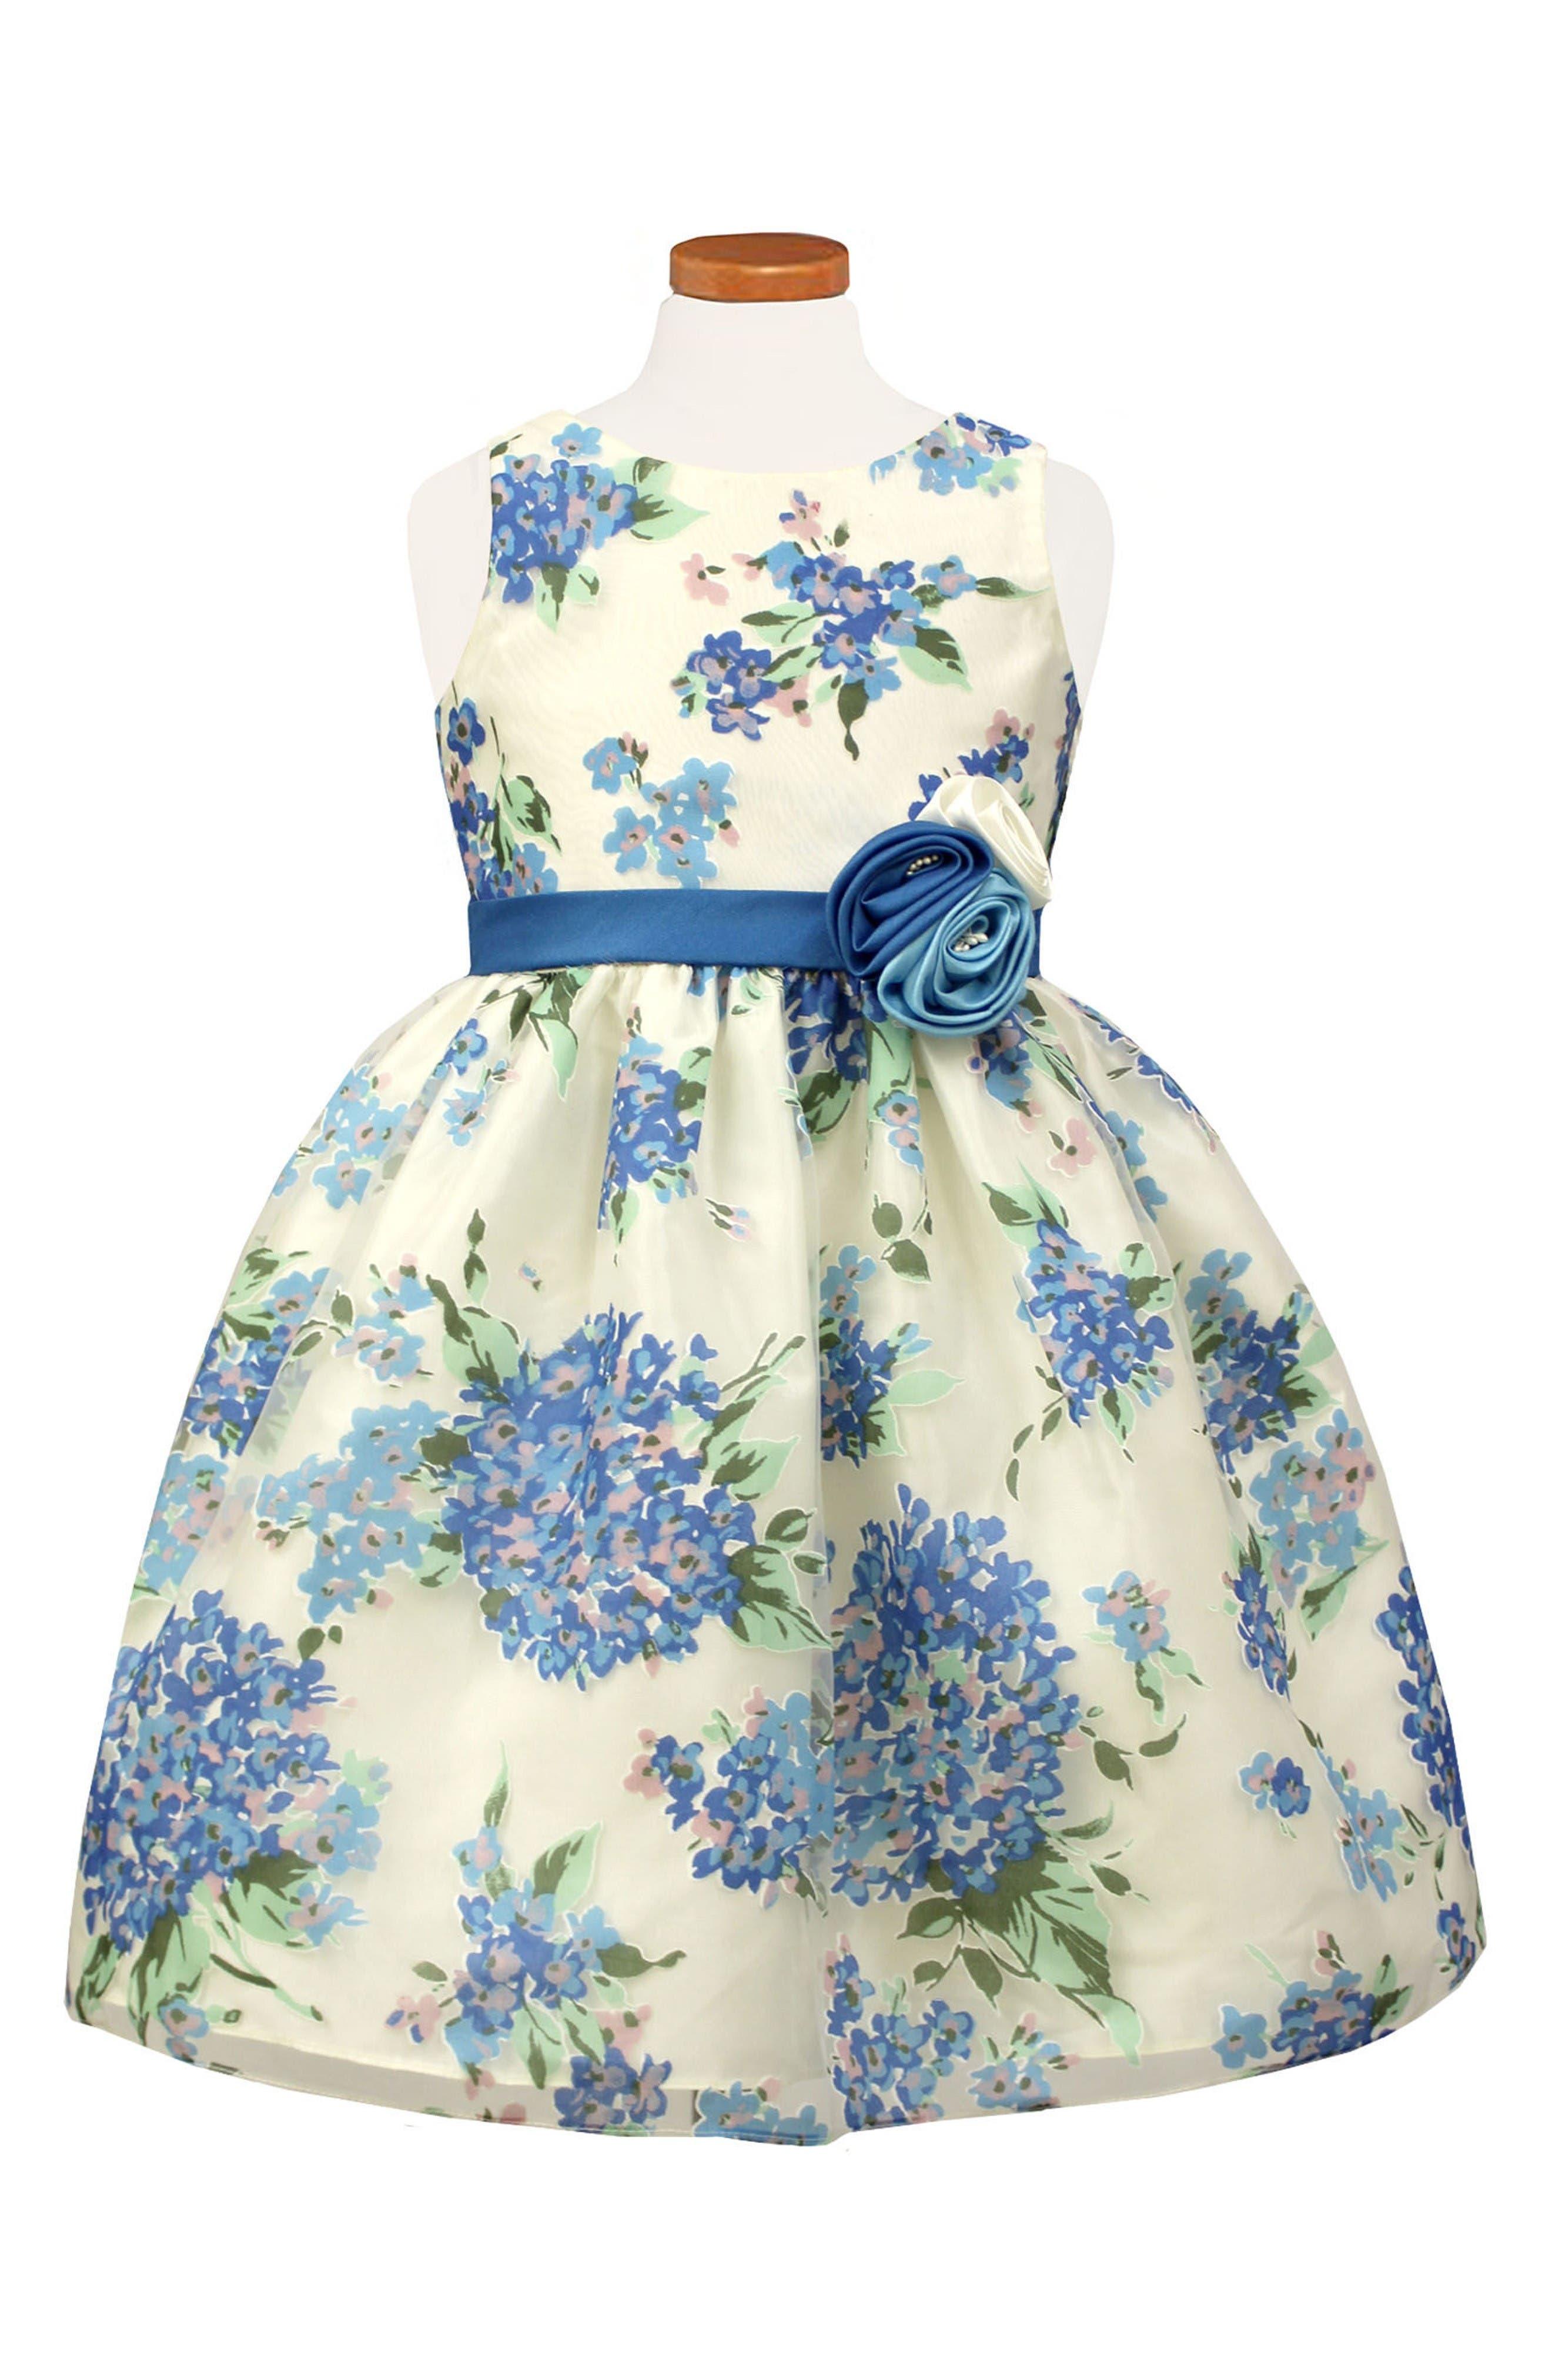 Alternate Image 1 Selected - Sorbet Hydrangea Burnout Dress (Big Girls)